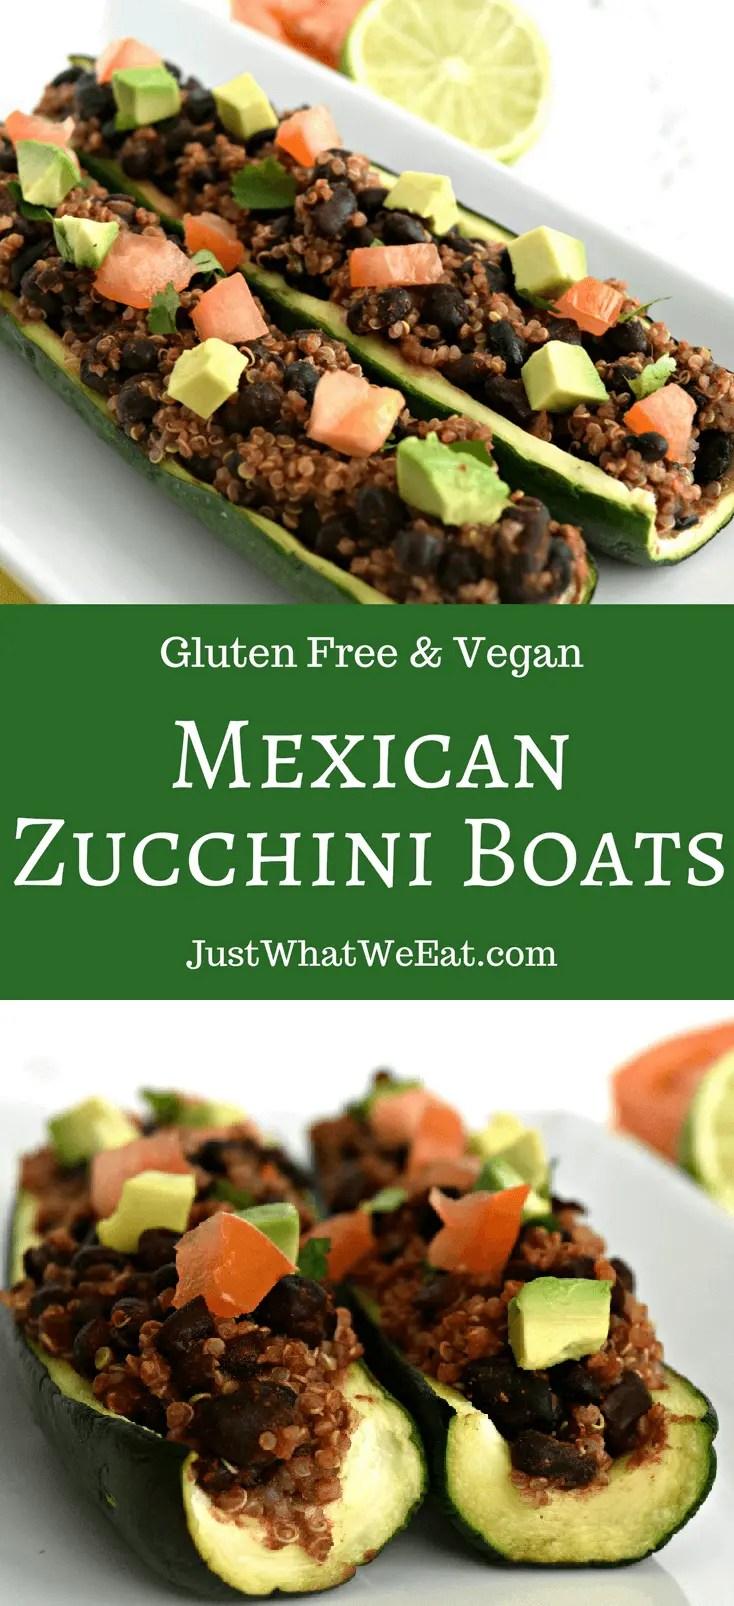 Mexican Zucchini Boats - Gluten Free & Vegan